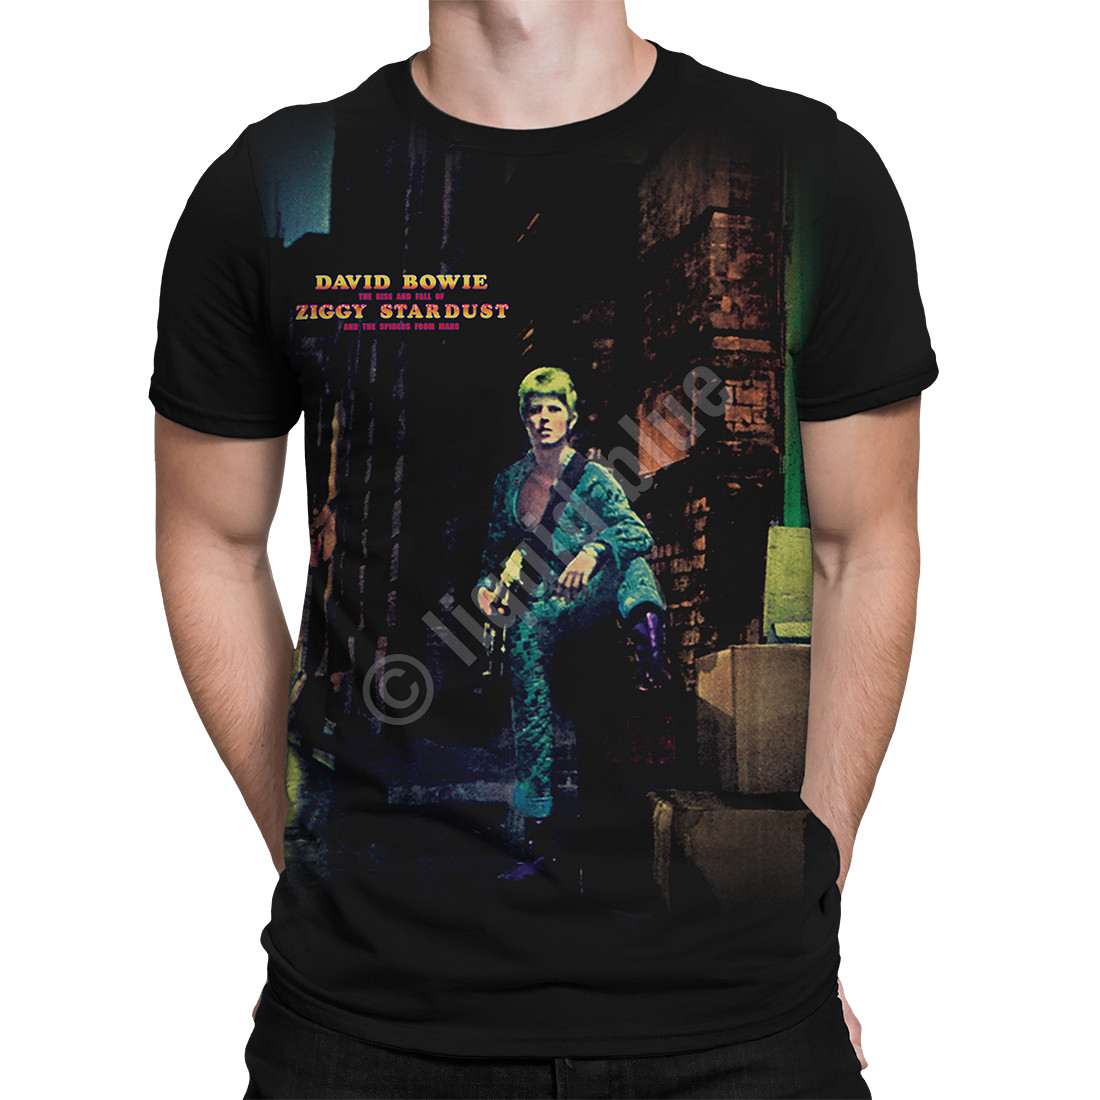 Ziggy Stardust Black Athletic T-Shirt